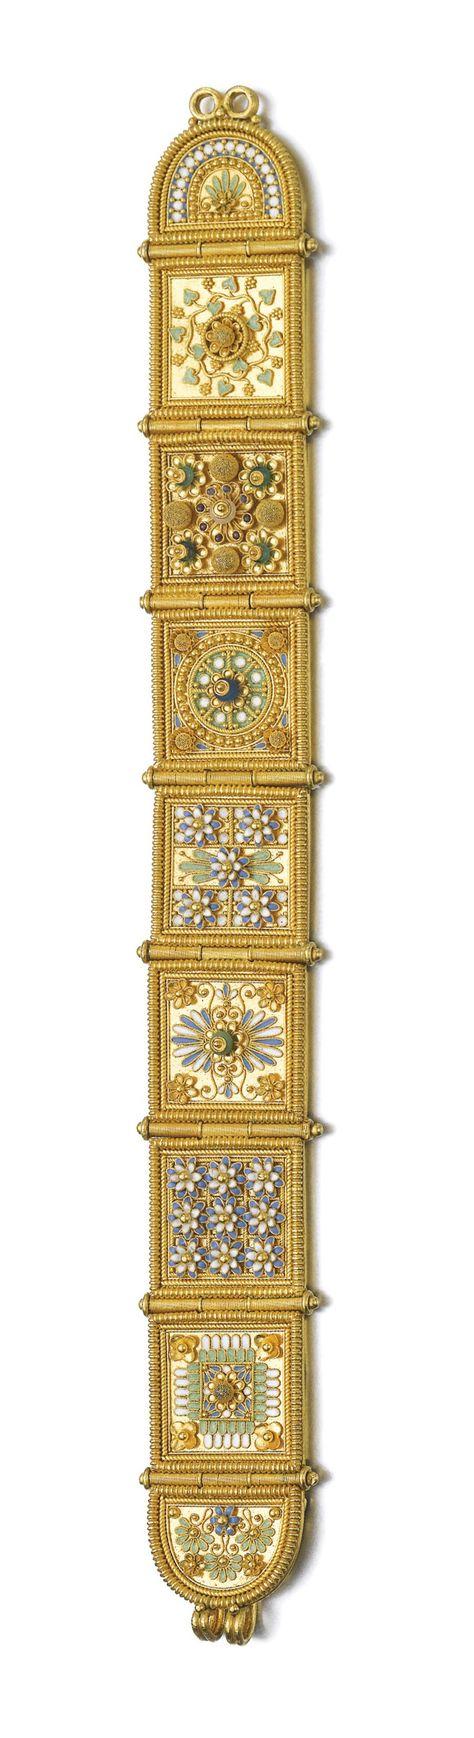 Gold and gem set bracelet giacinto melillo late th century the